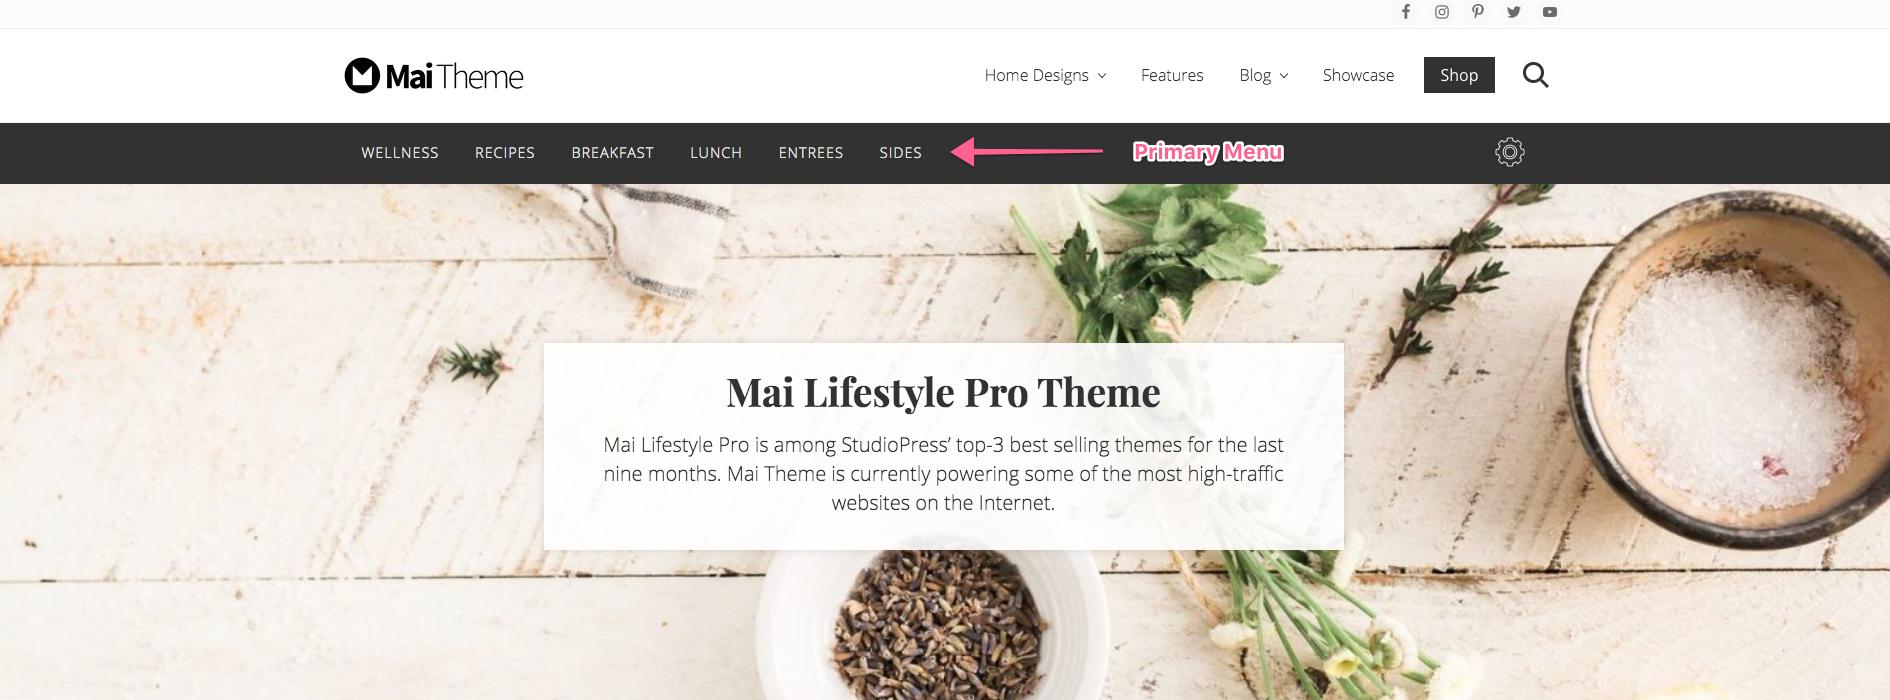 primary-menu screen image